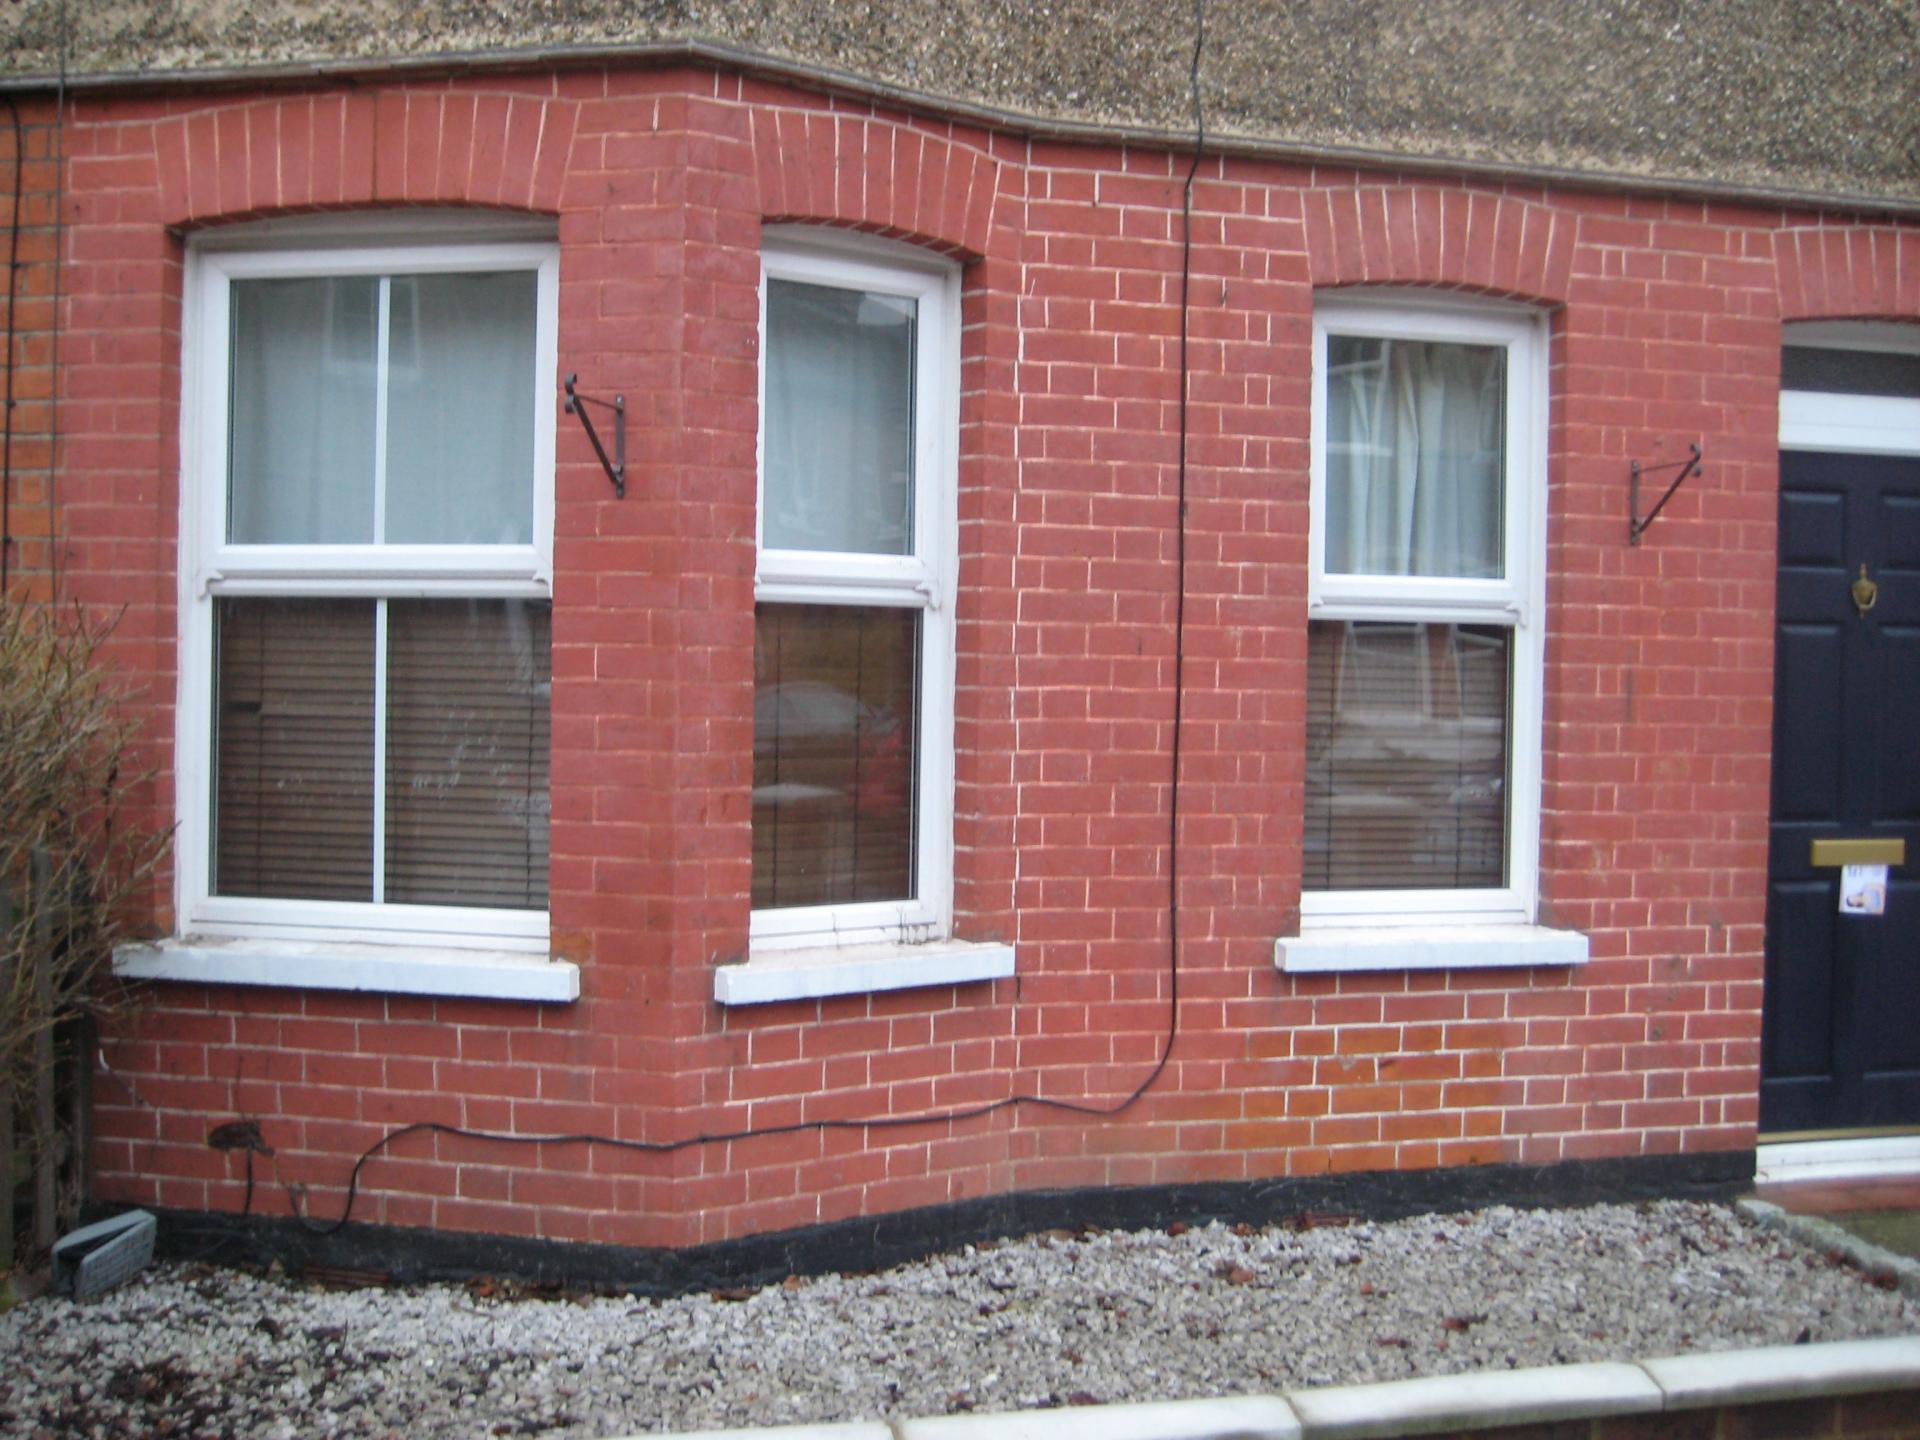 Ladysmith Road, St Albans - Before